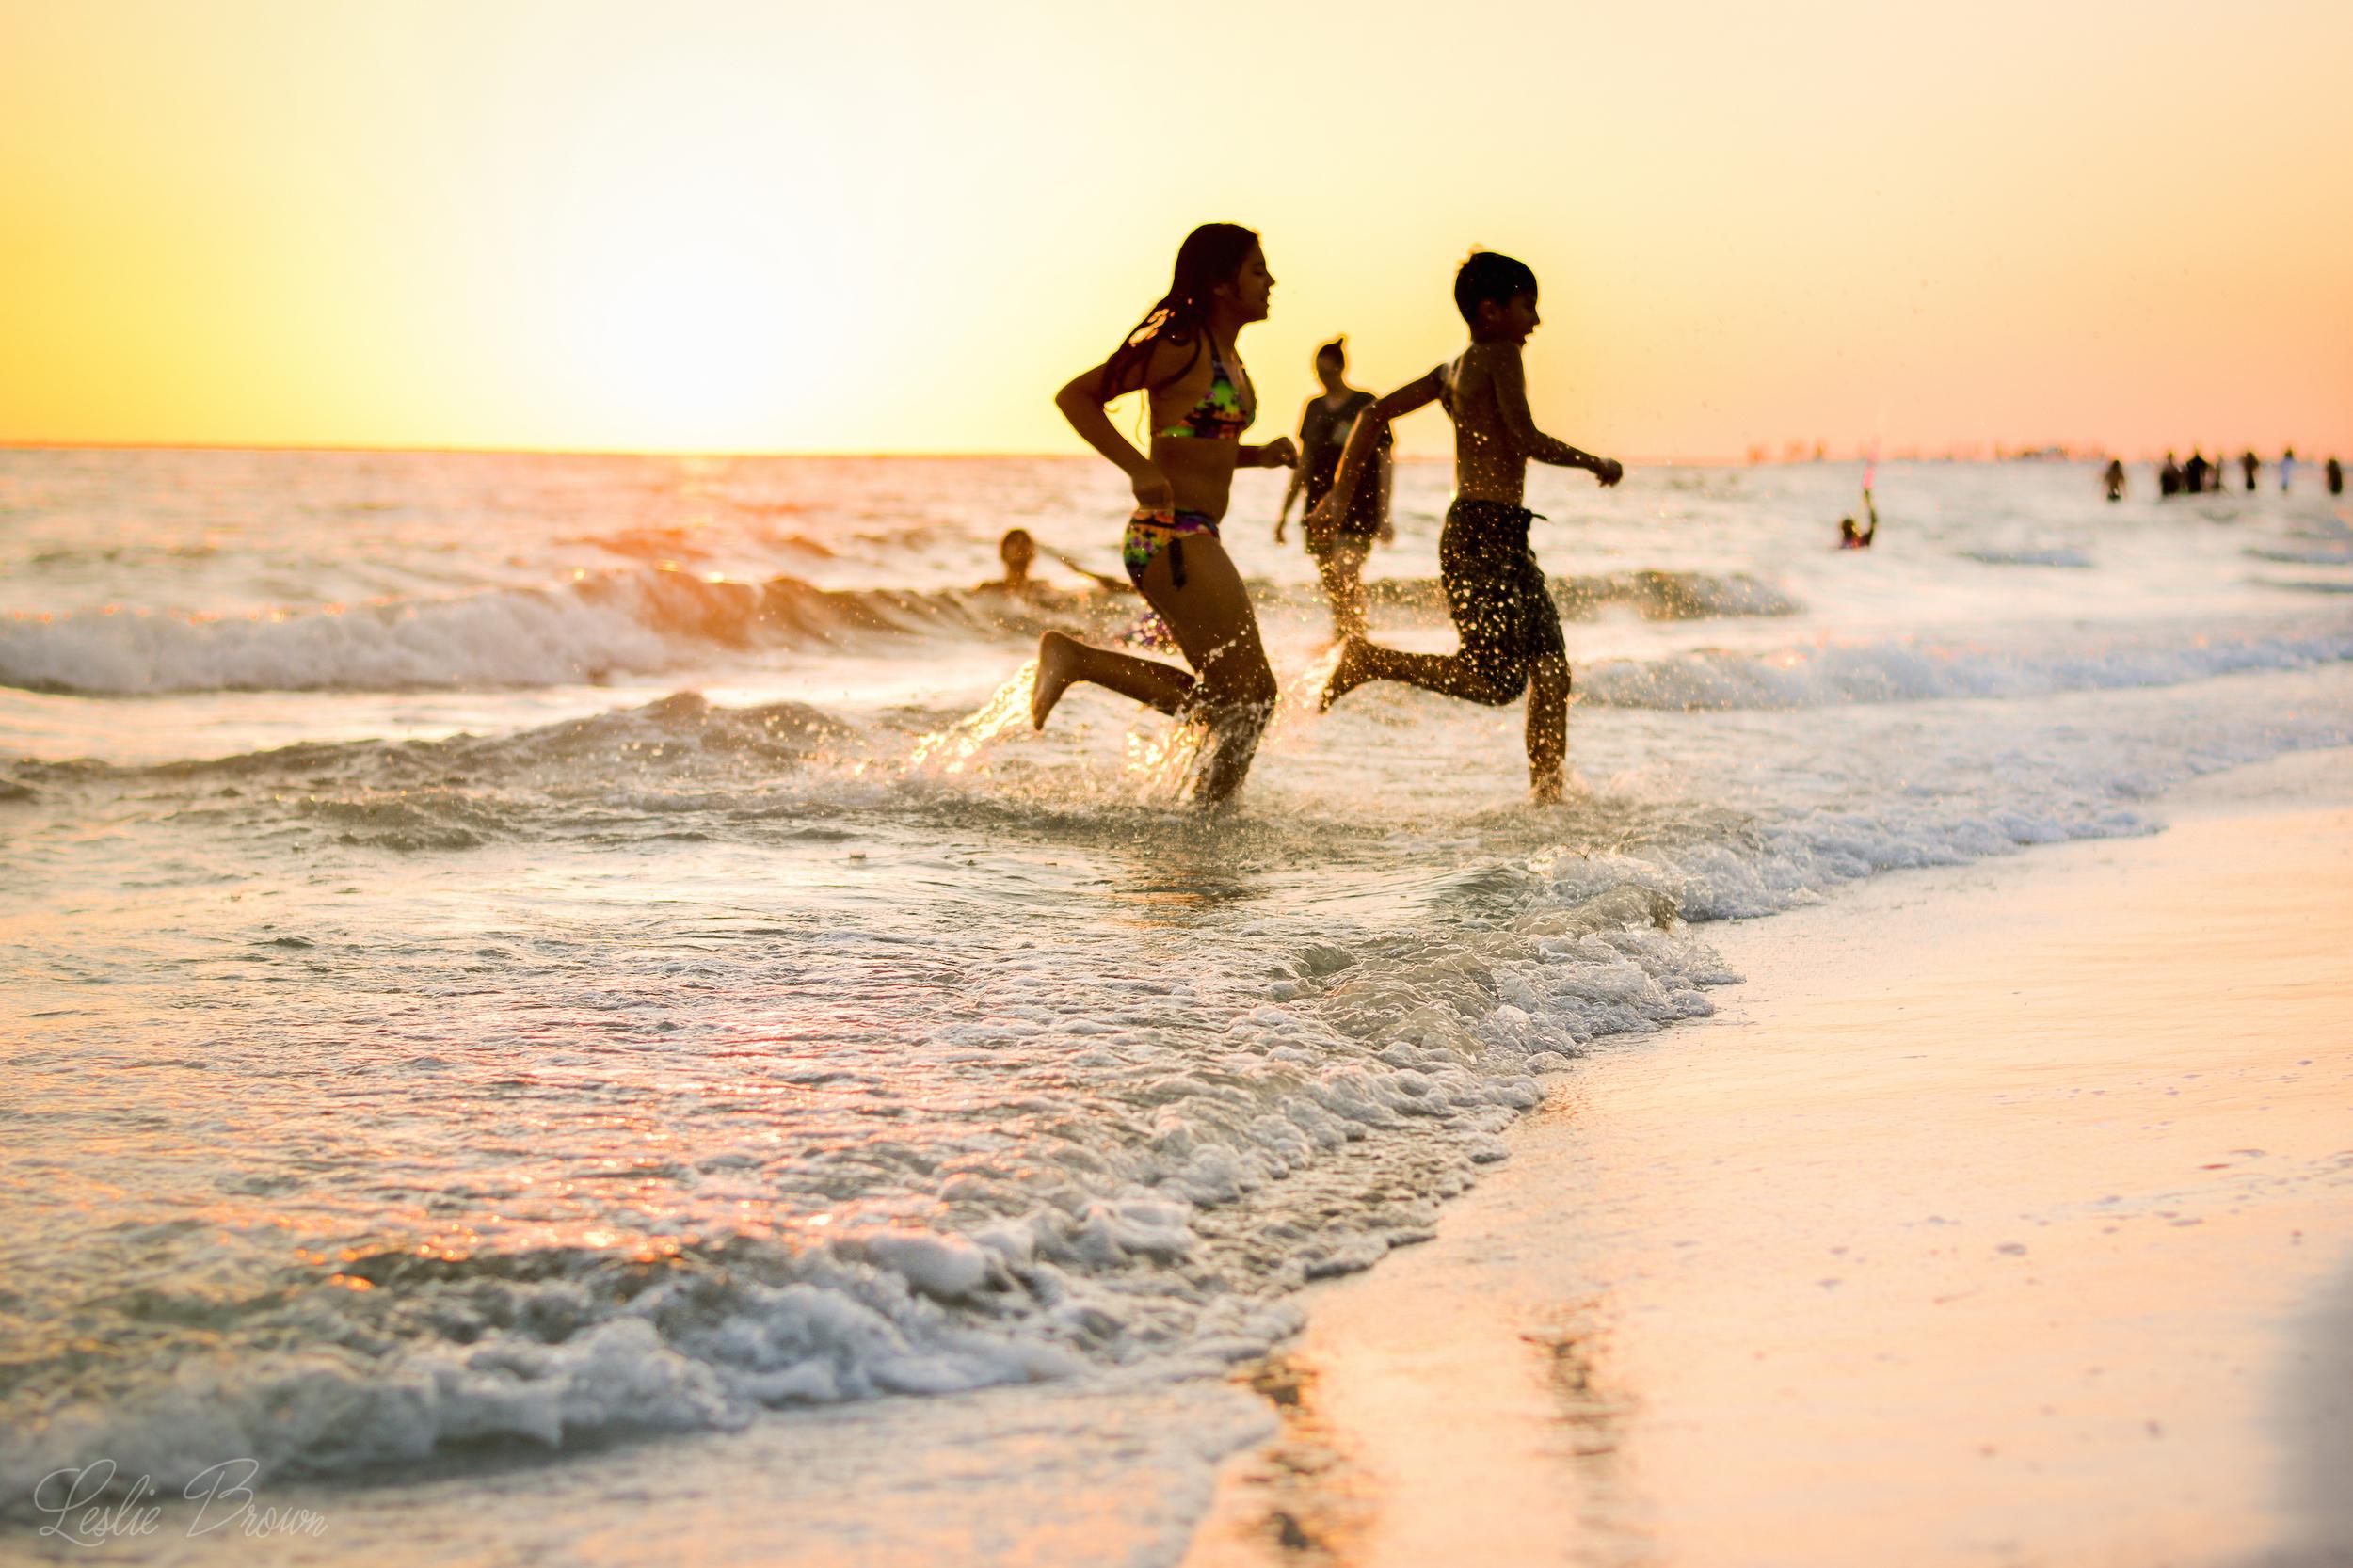 Kids on the beach - Leslie Brown